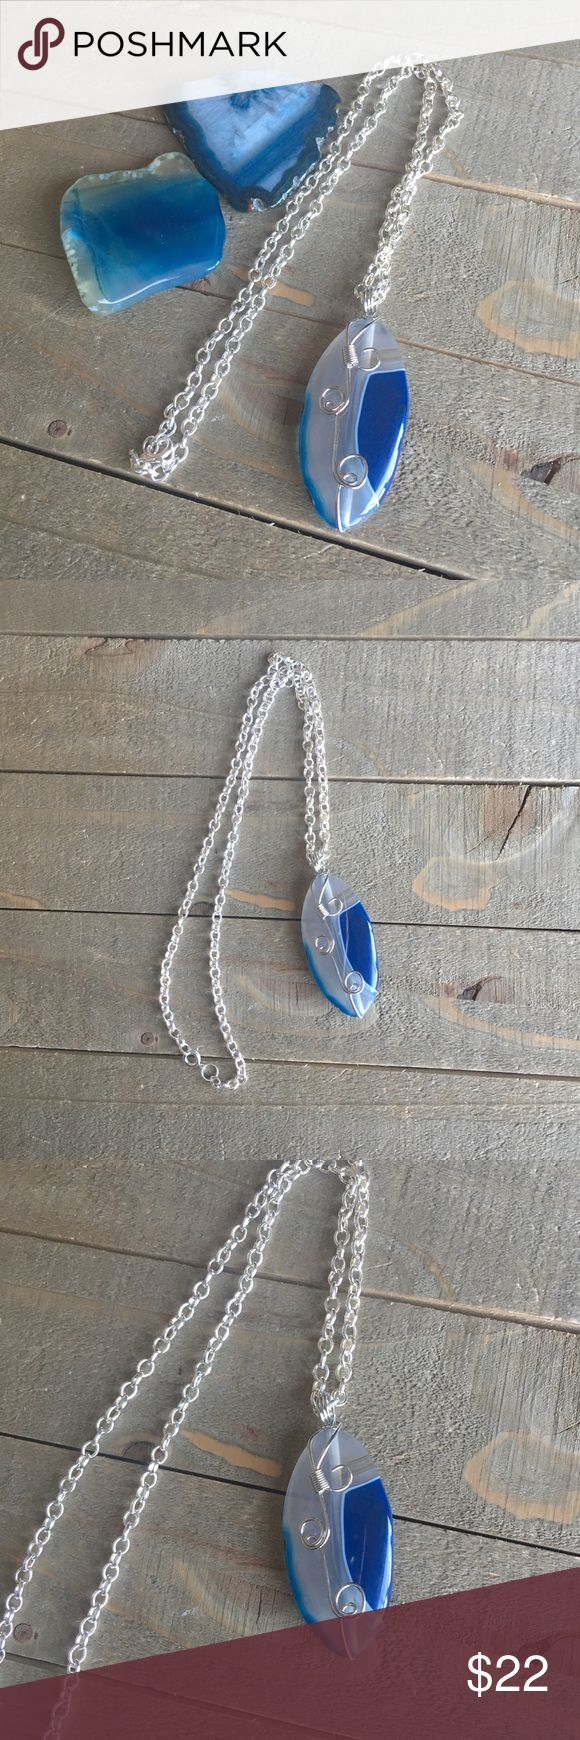 1070 best Best Handmade jewelry images on Pinterest | Handmade ...